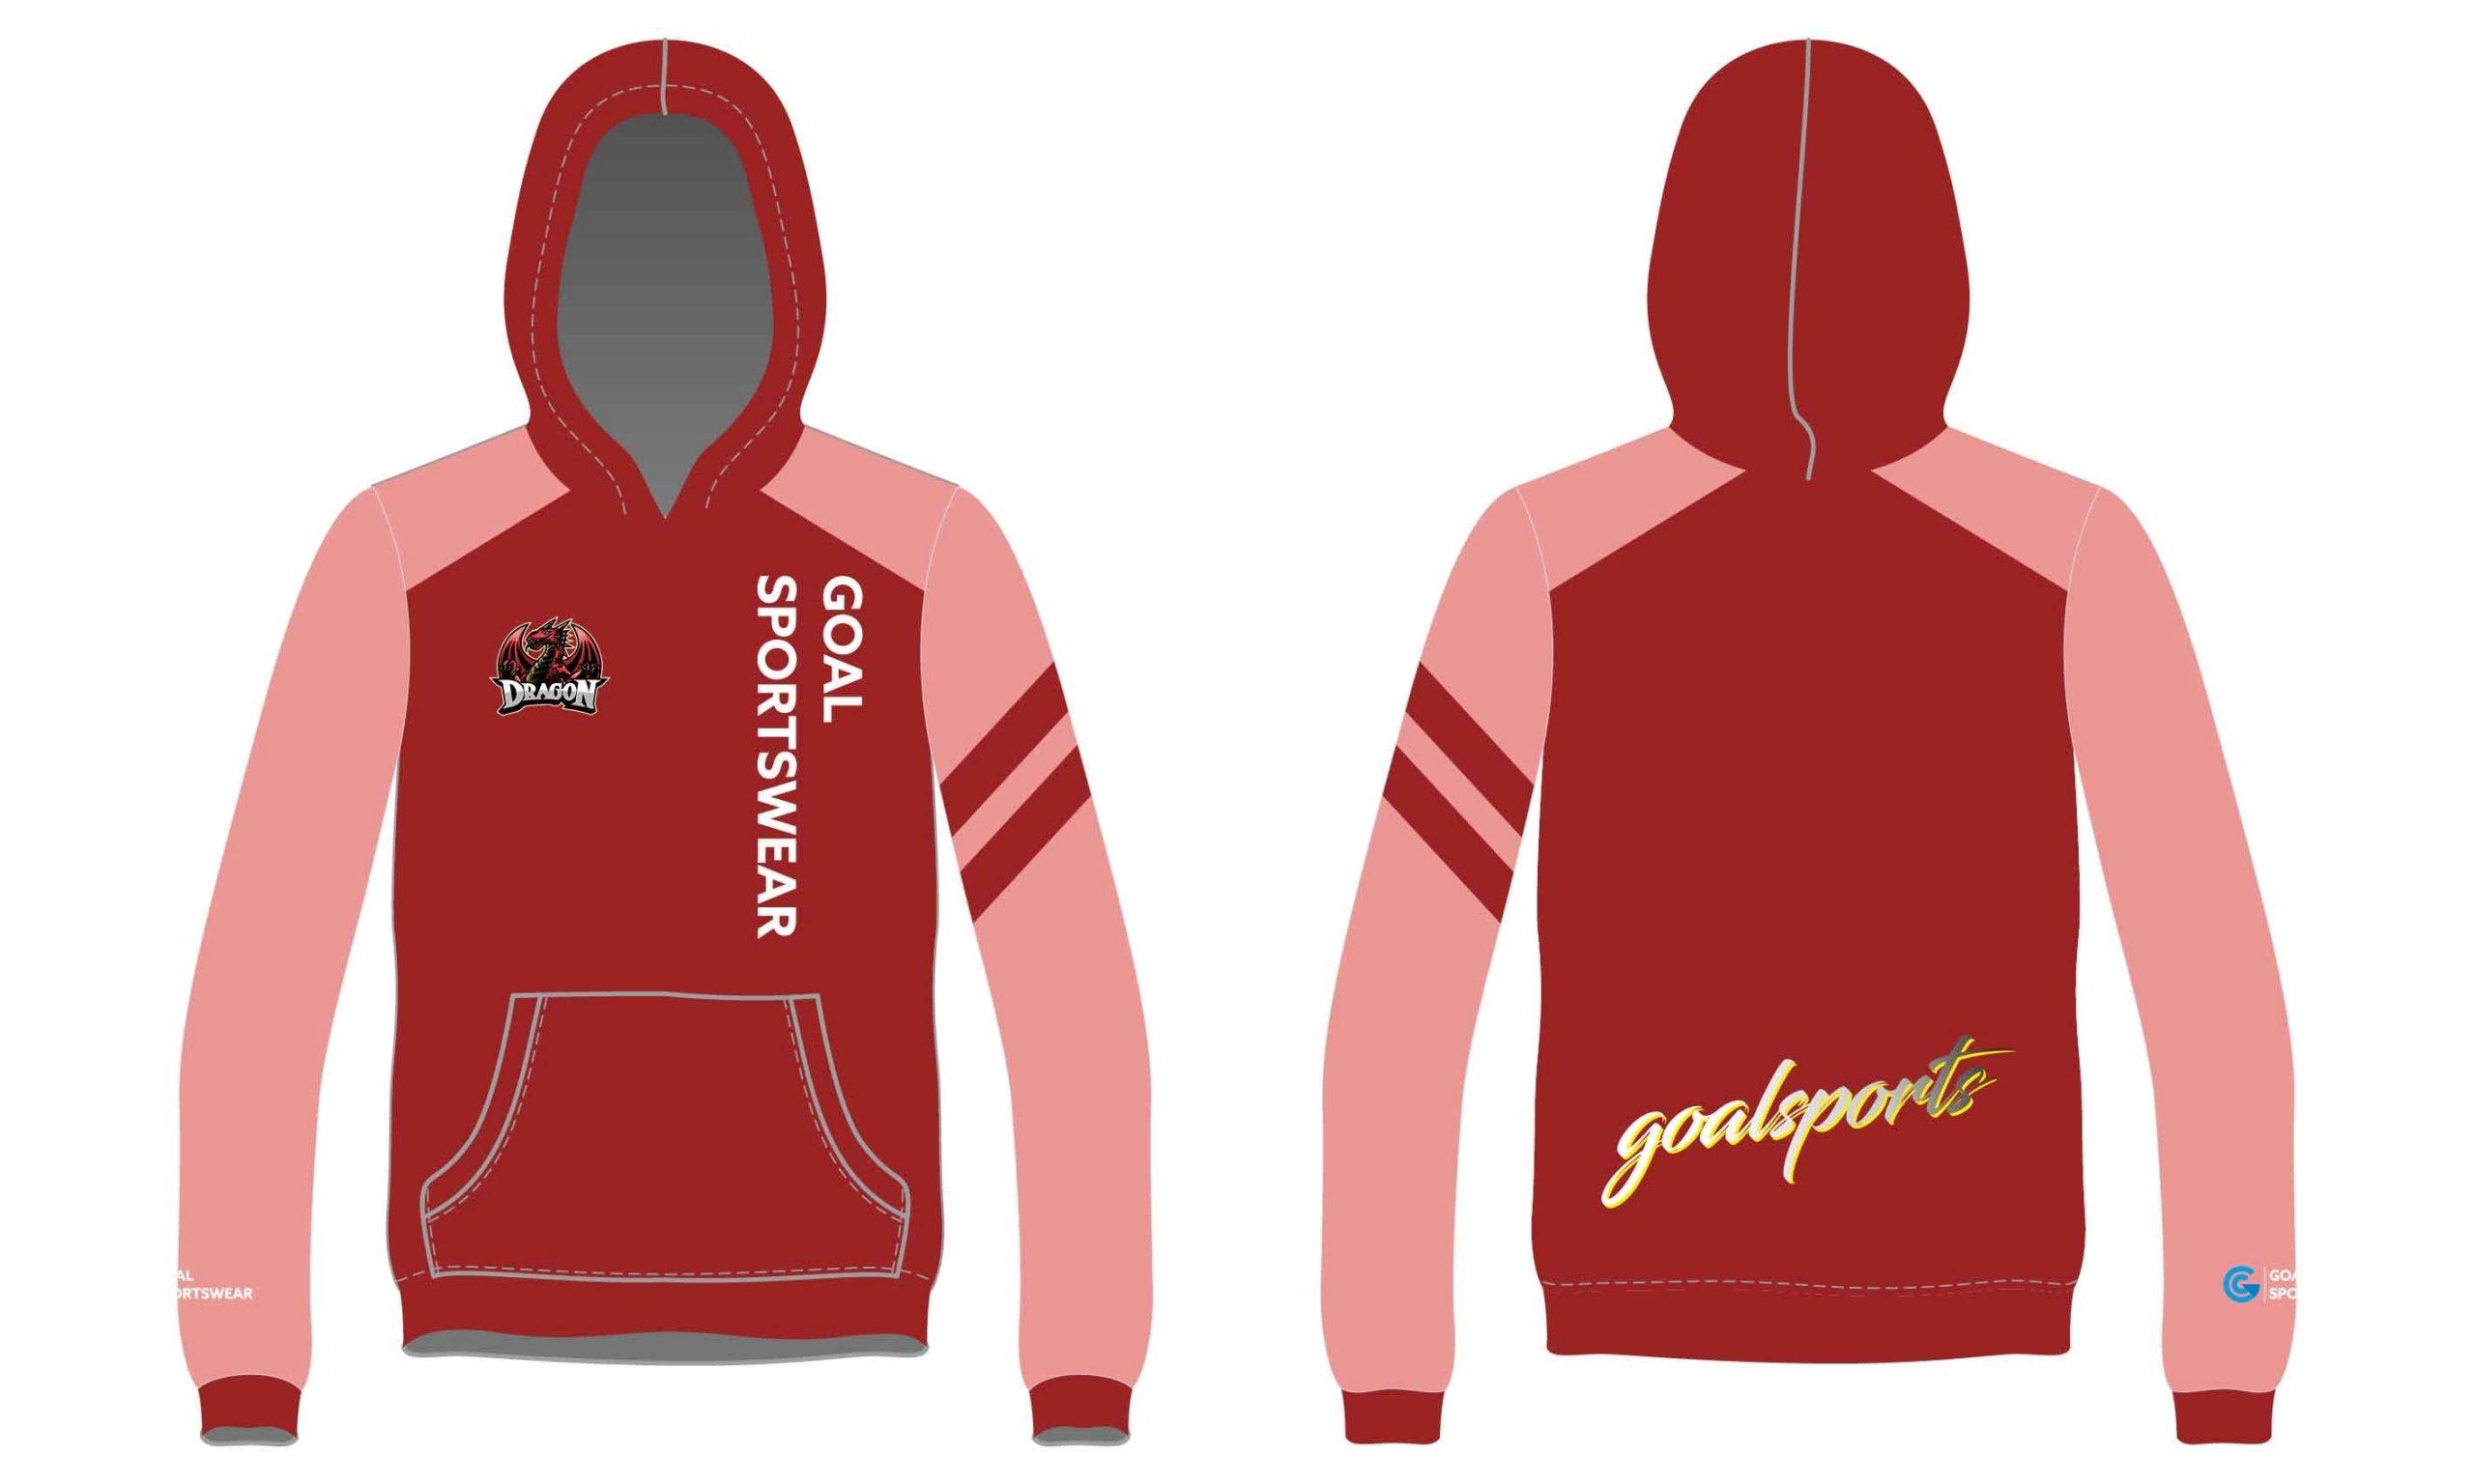 Custom made sublimation printing mens pro wrestling sweatshirts